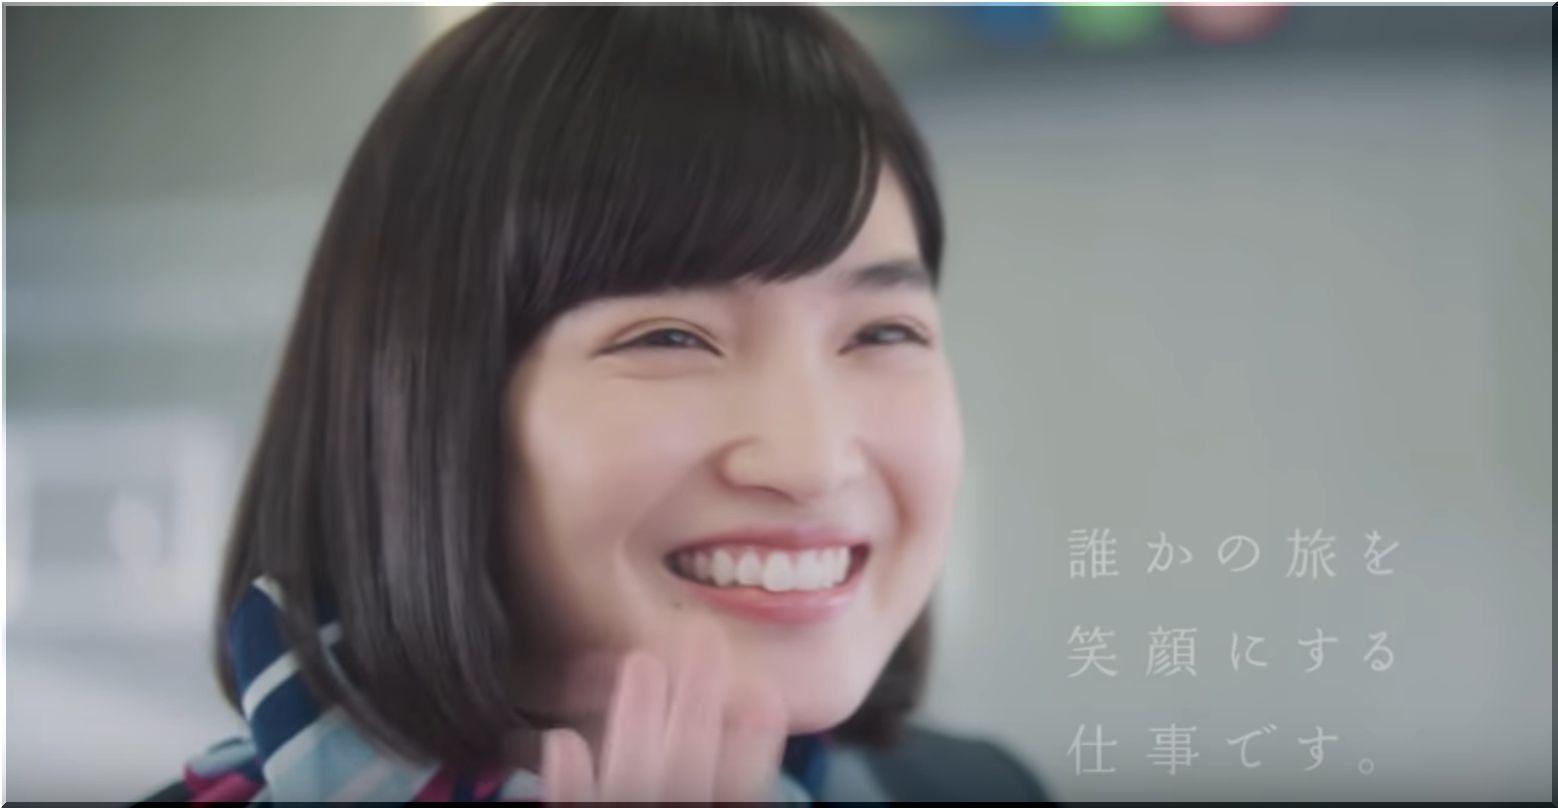 【JR・J-CreationCM】ホームの少女に笑顔で手を振るアテンダントは誰?